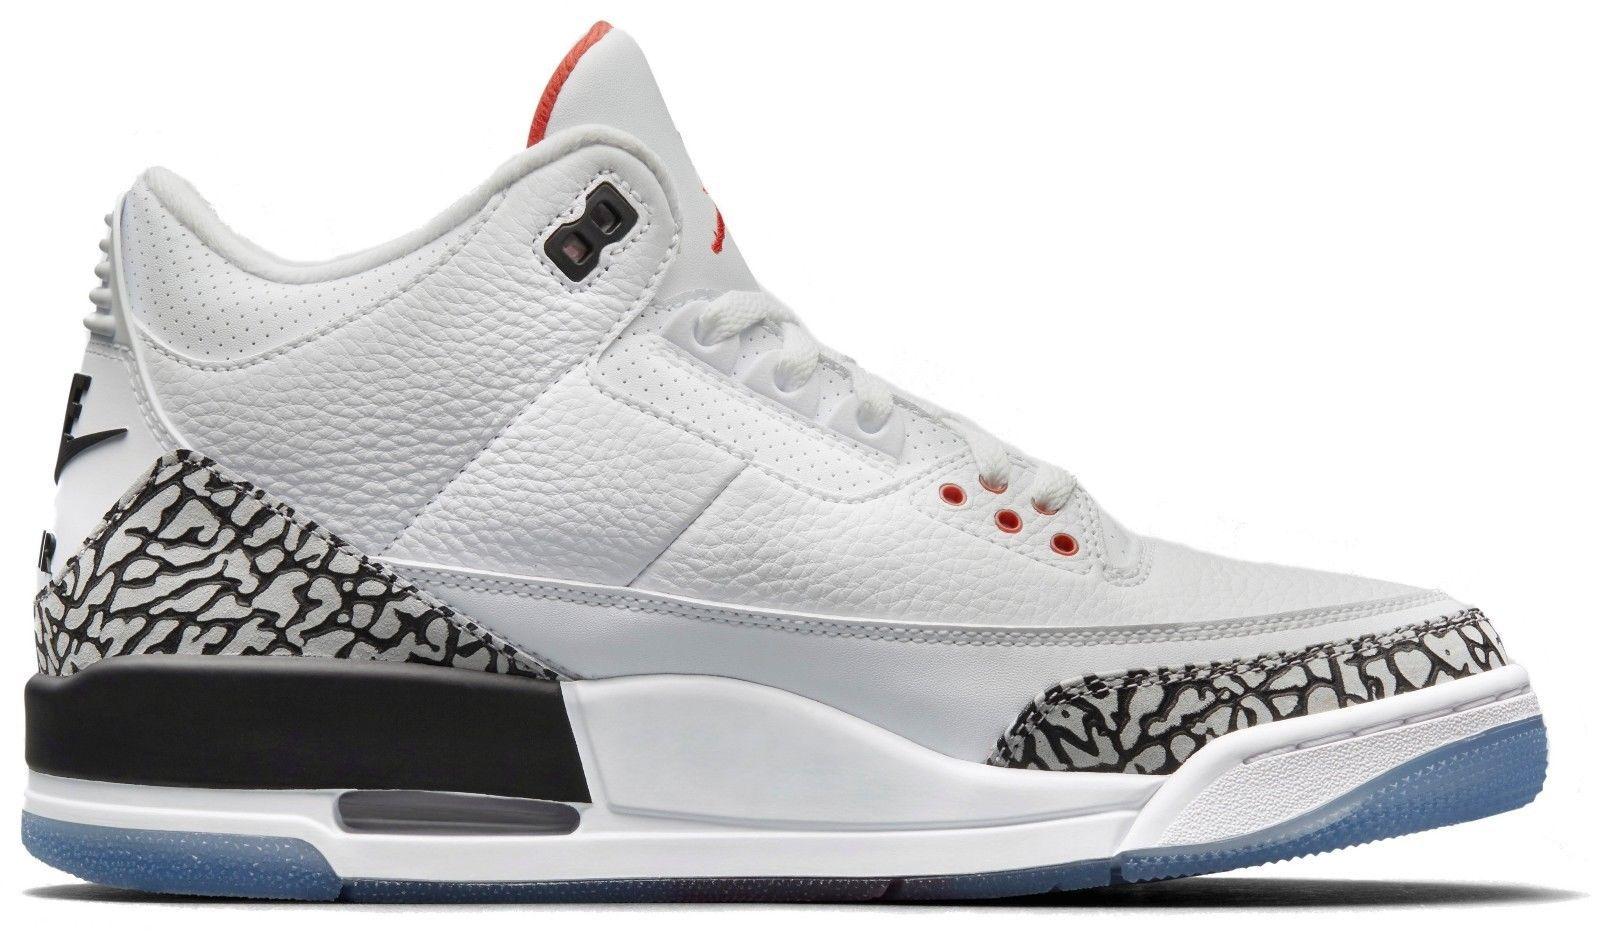 Nike Air Jordan 3 Free Throw Line White Cement Retro III OG 88 outlet 923096 101